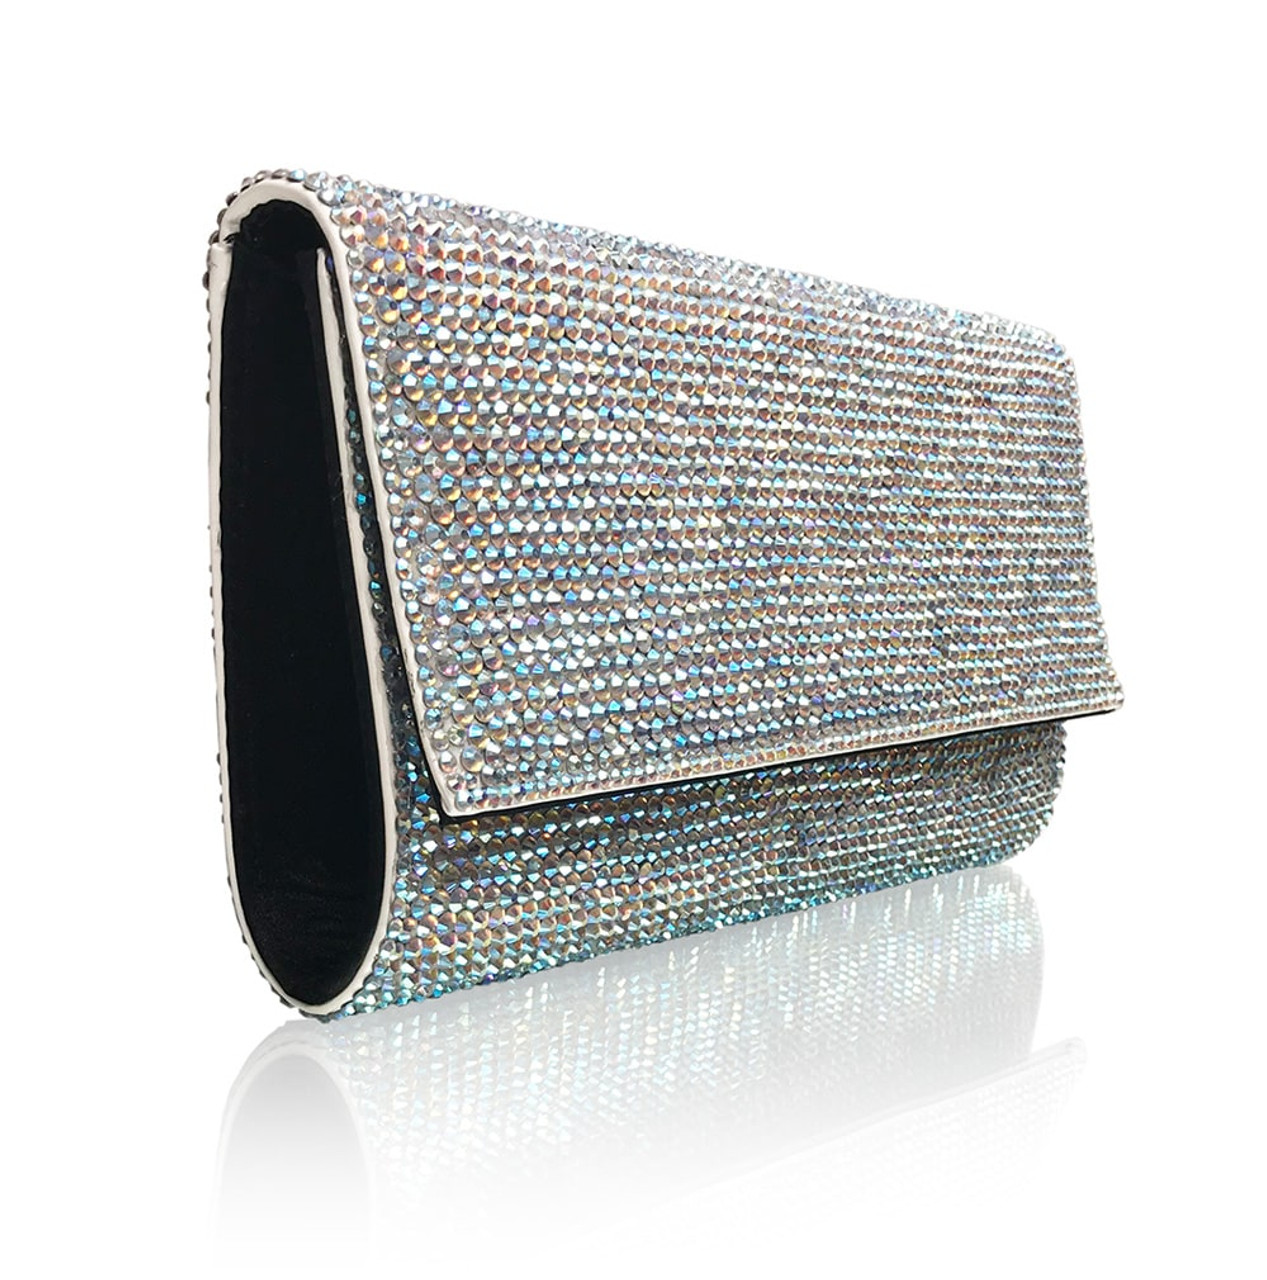 Straight Flap purse